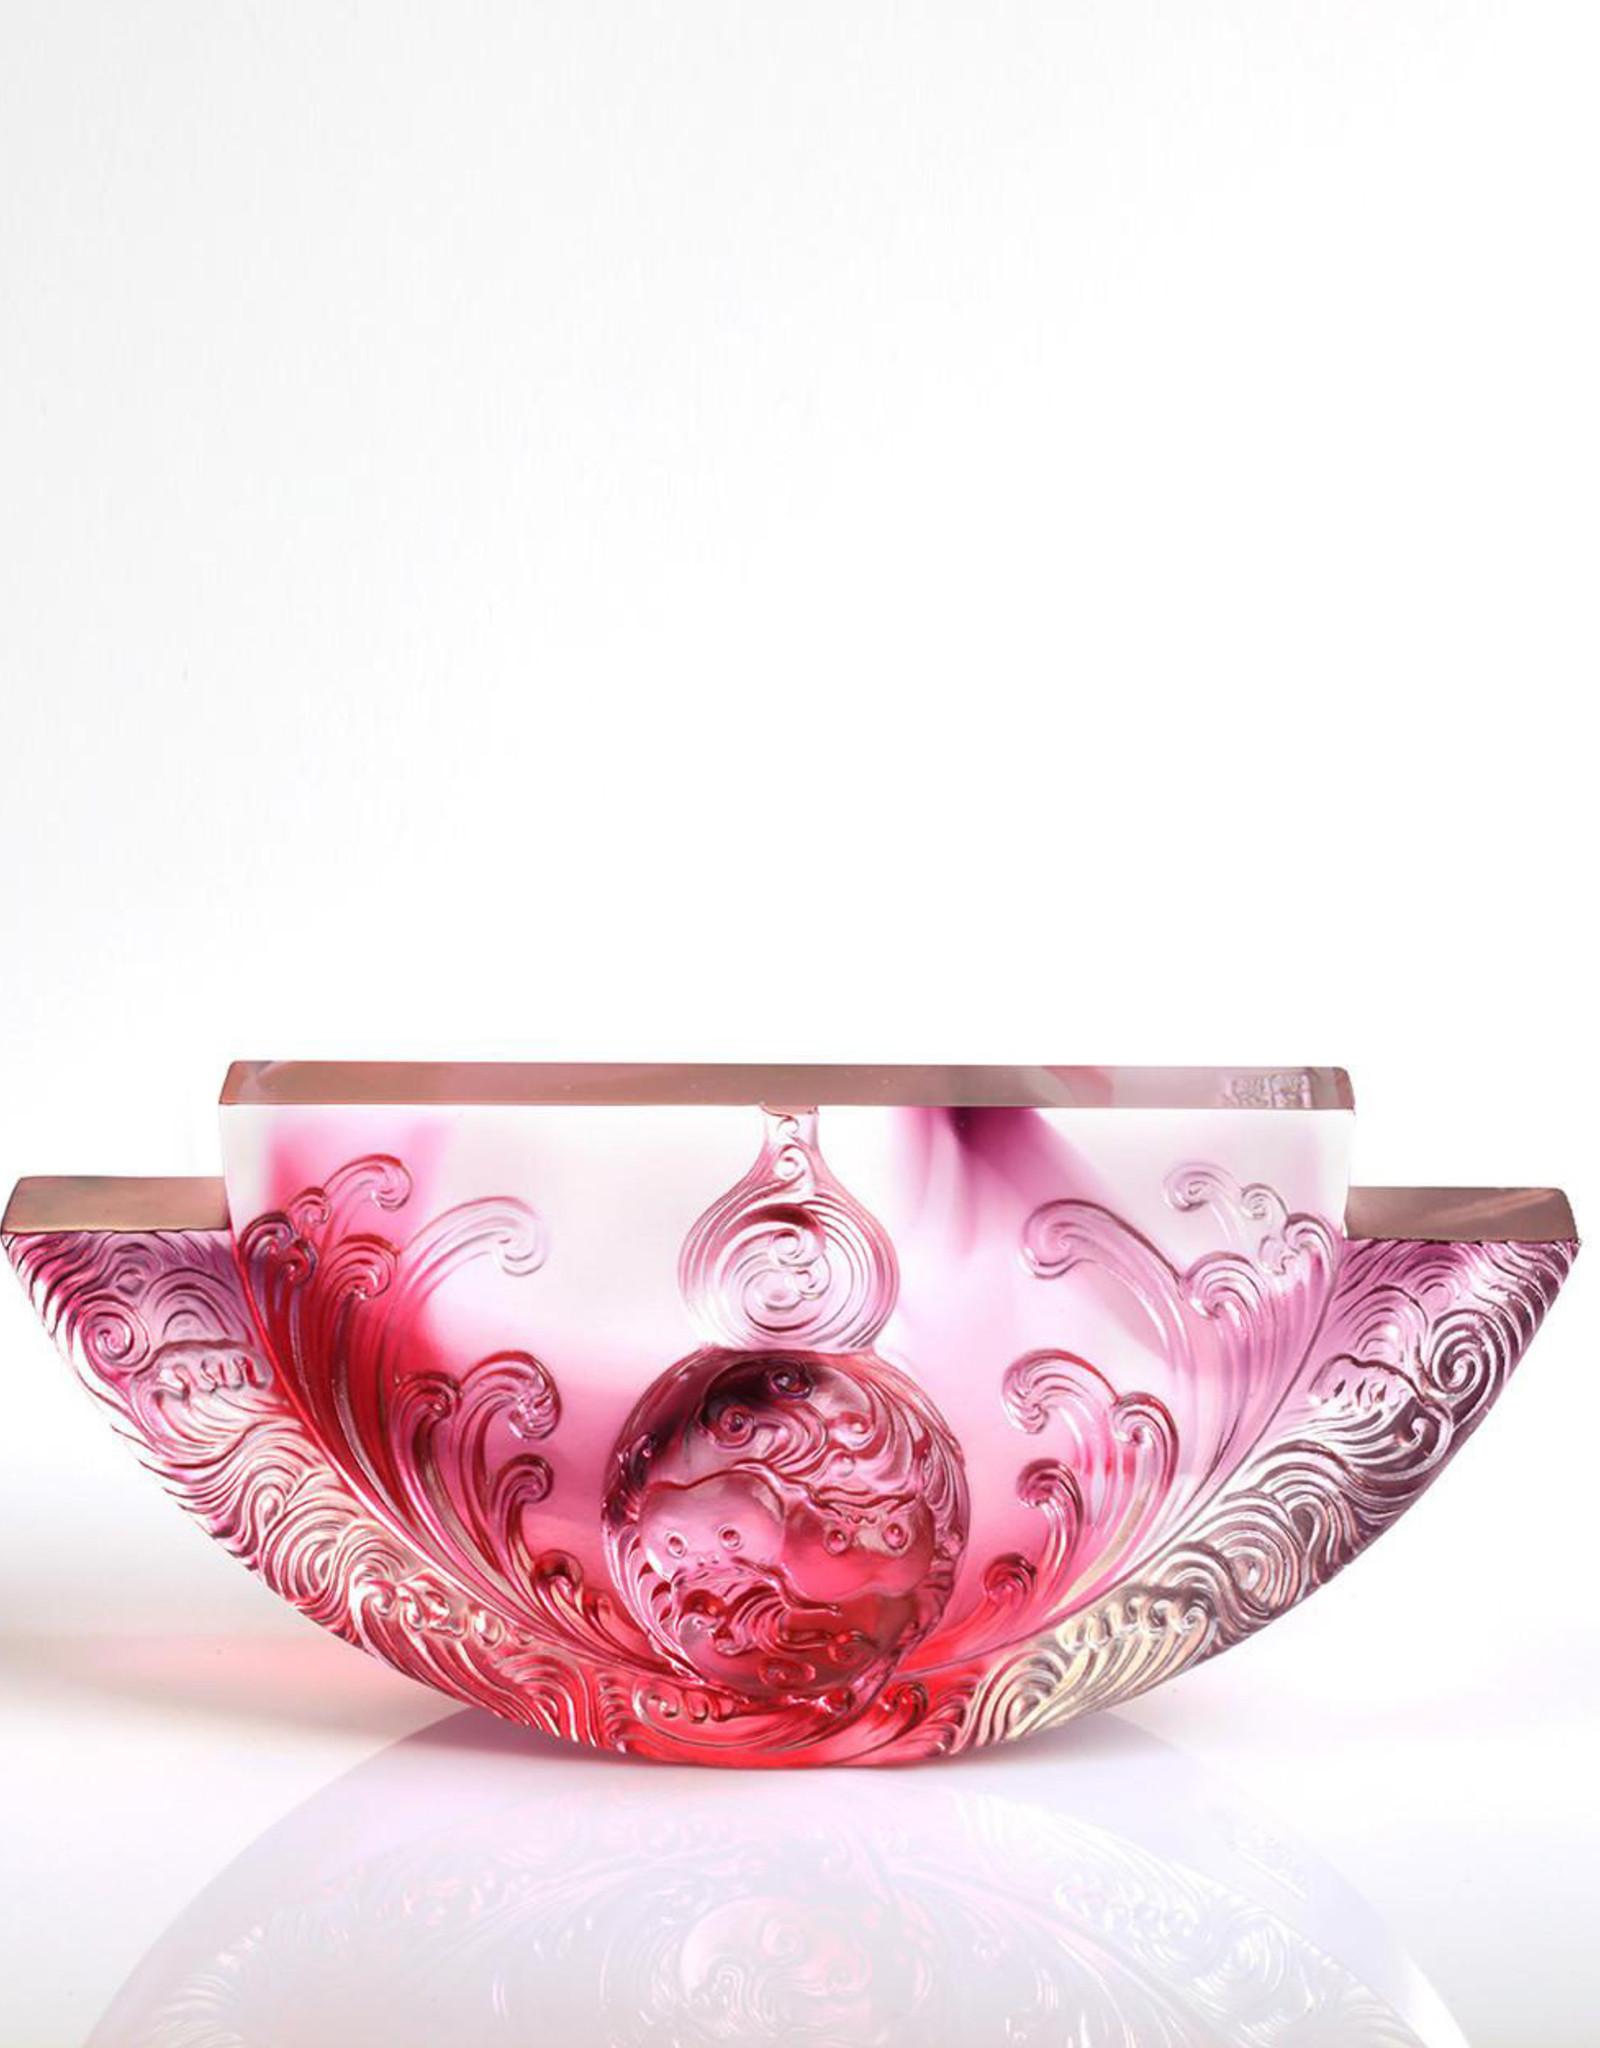 LIULI Crystal Art Crystal Hulu, The Beauty of Harmony, Harmony Permeates the Land, Gold Red Purple